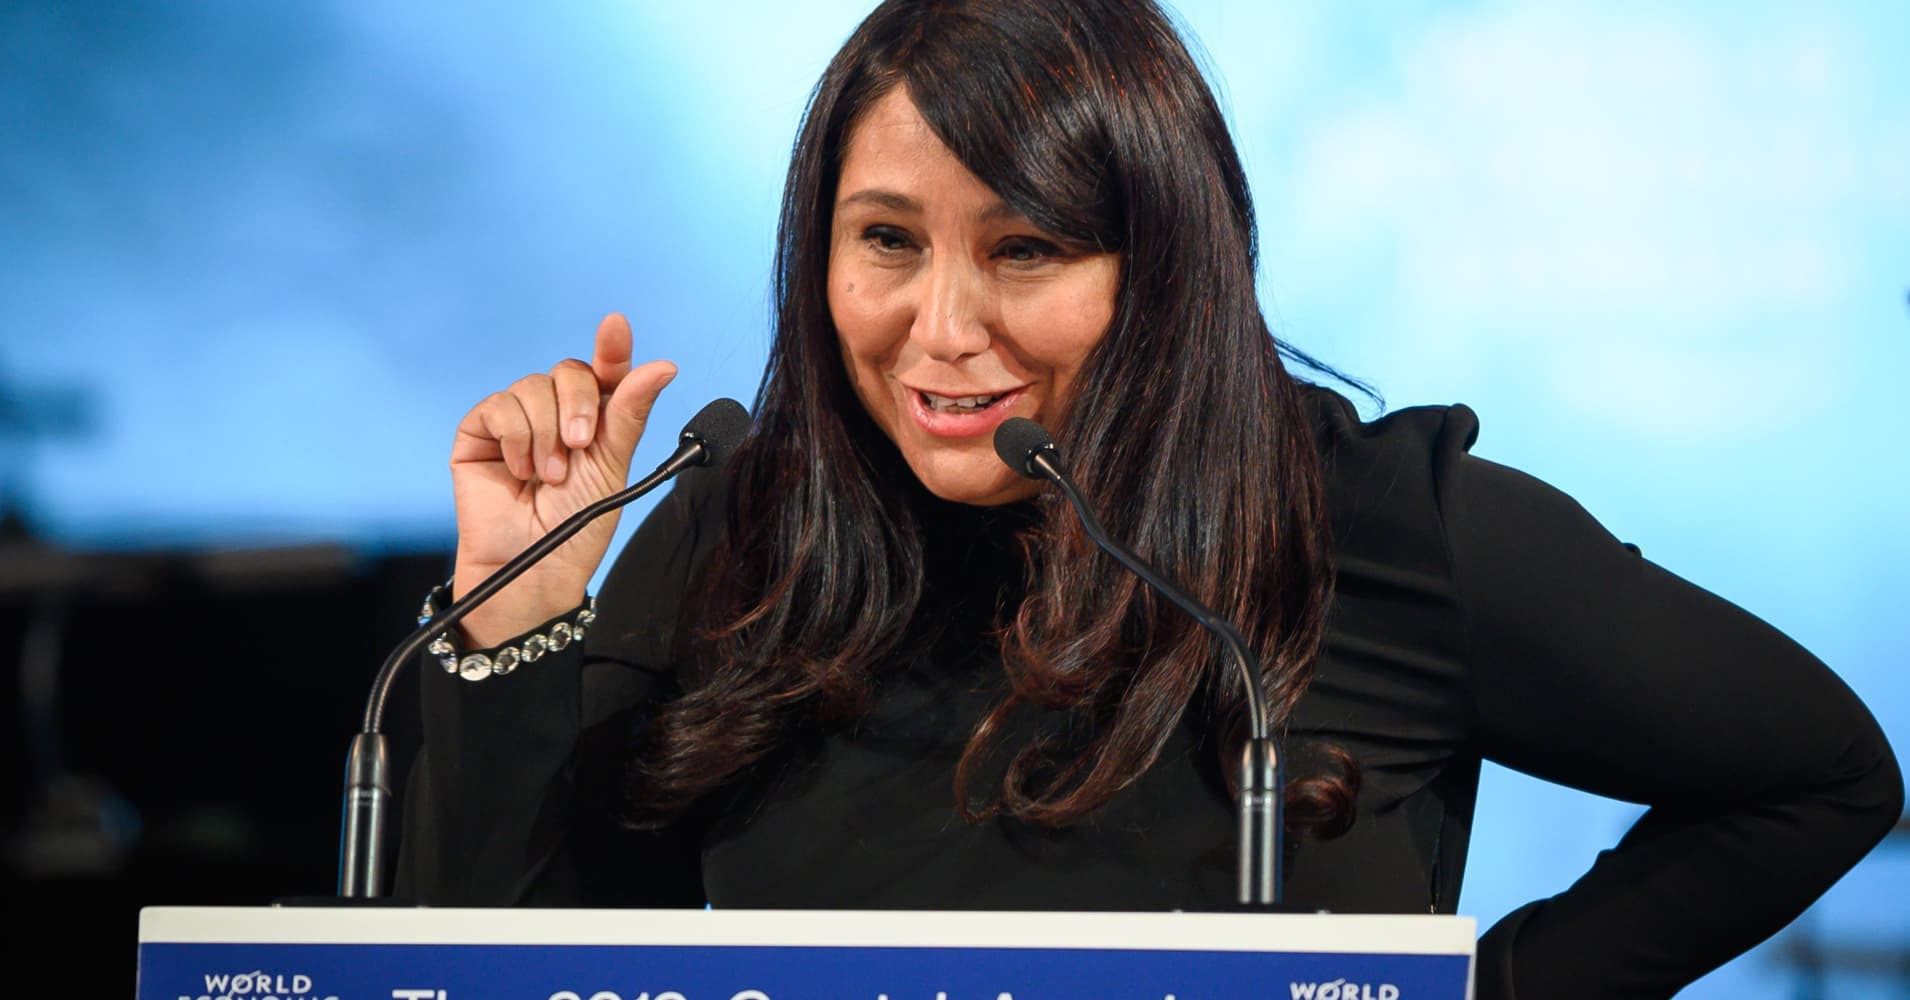 Stop portraying Arab women as victims, leading Saudi filmmaker says